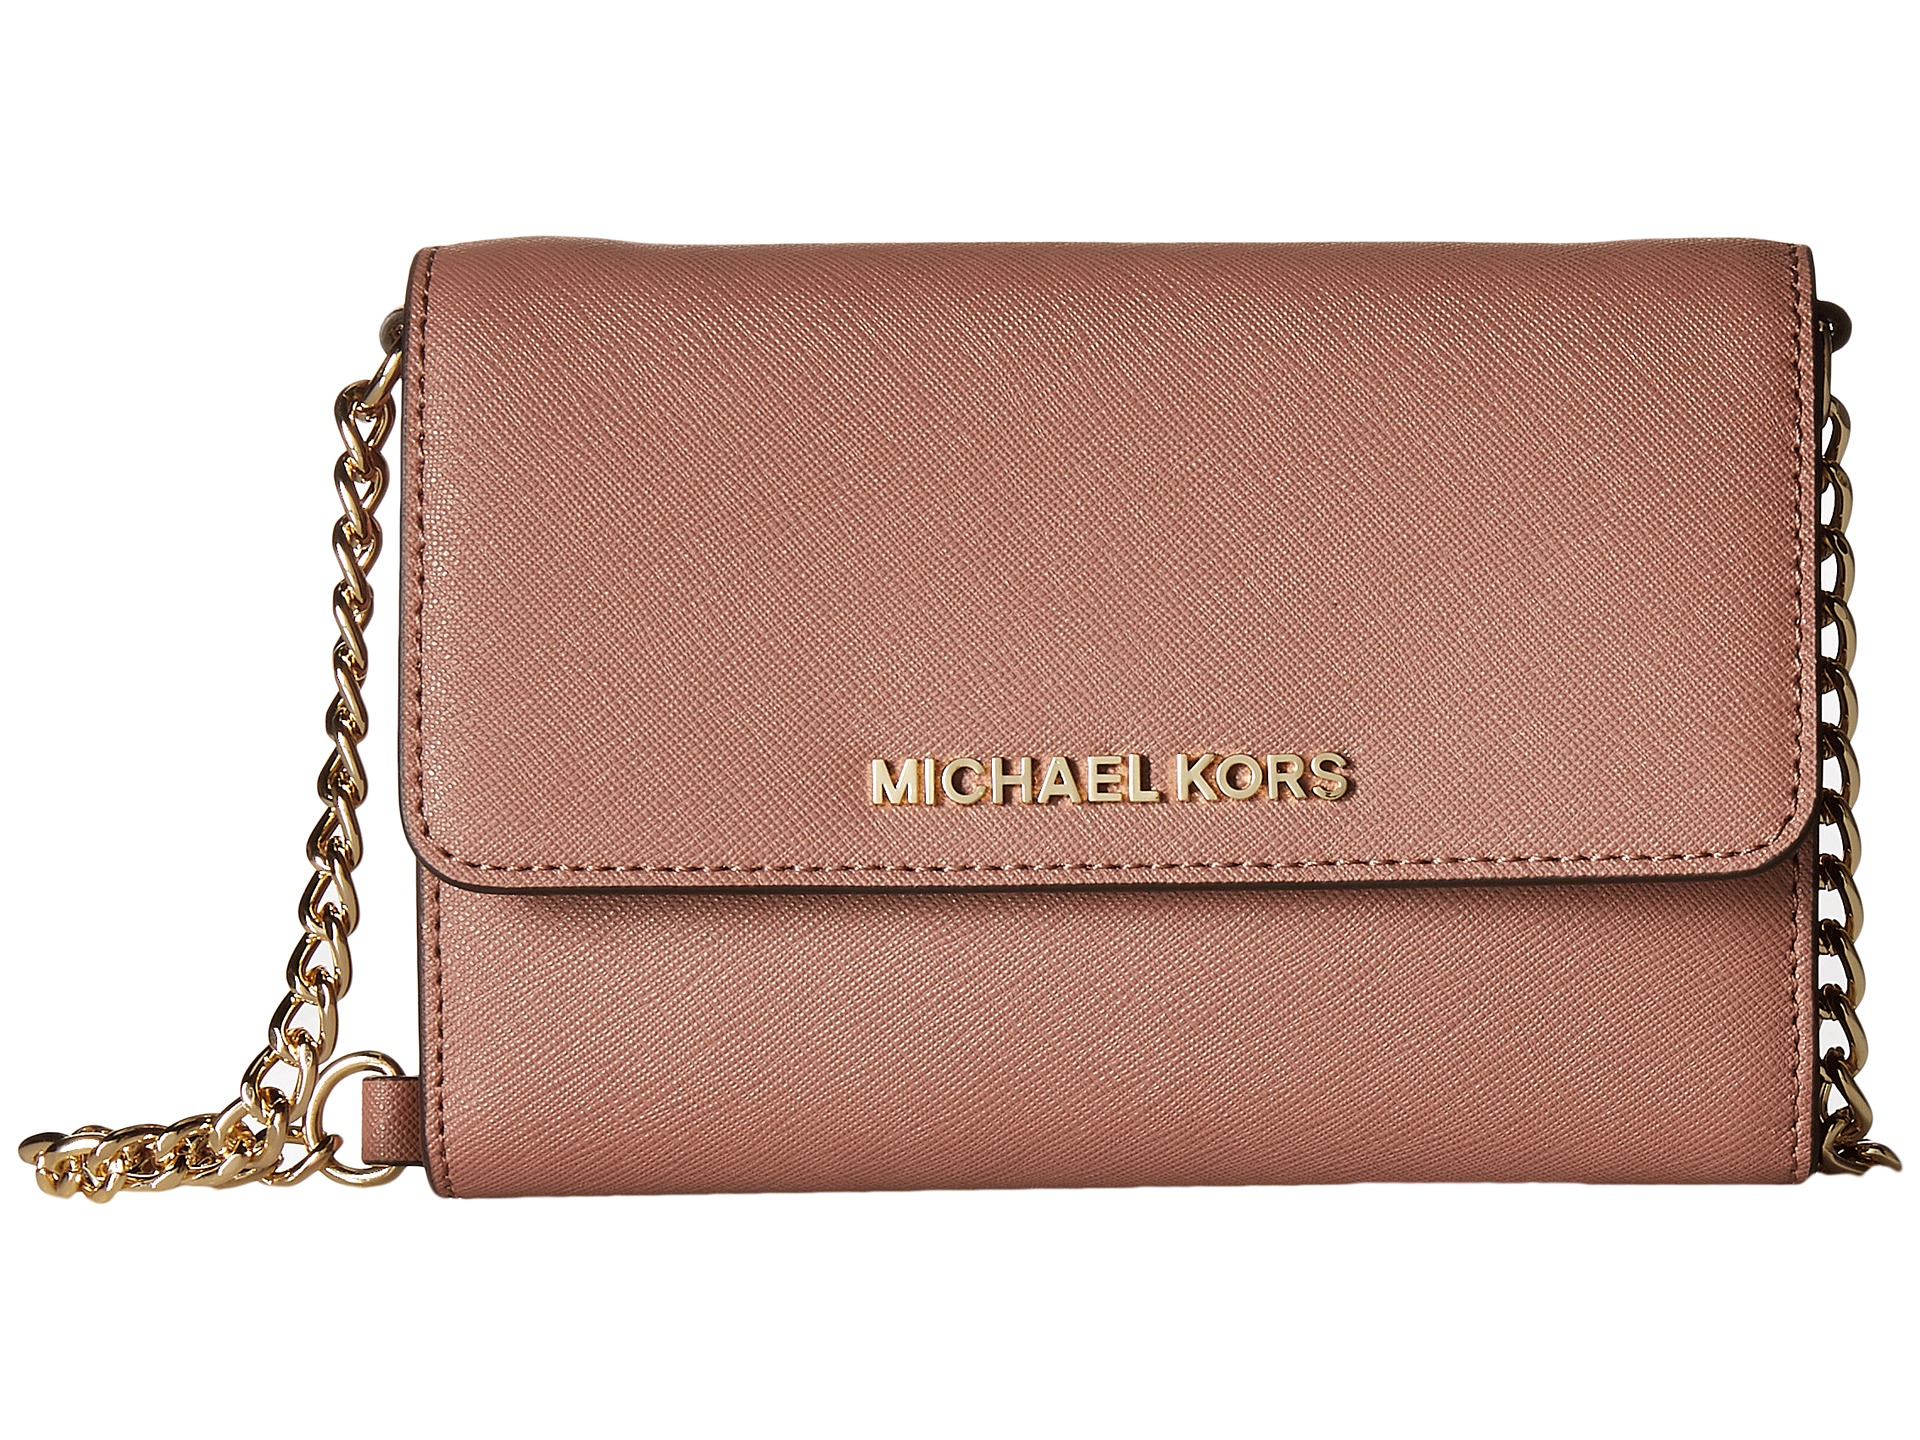 642a1d8d253b MICHAEL Michael Kors Jet Set Travel Large Phone Crossbody in Pink - Lyst